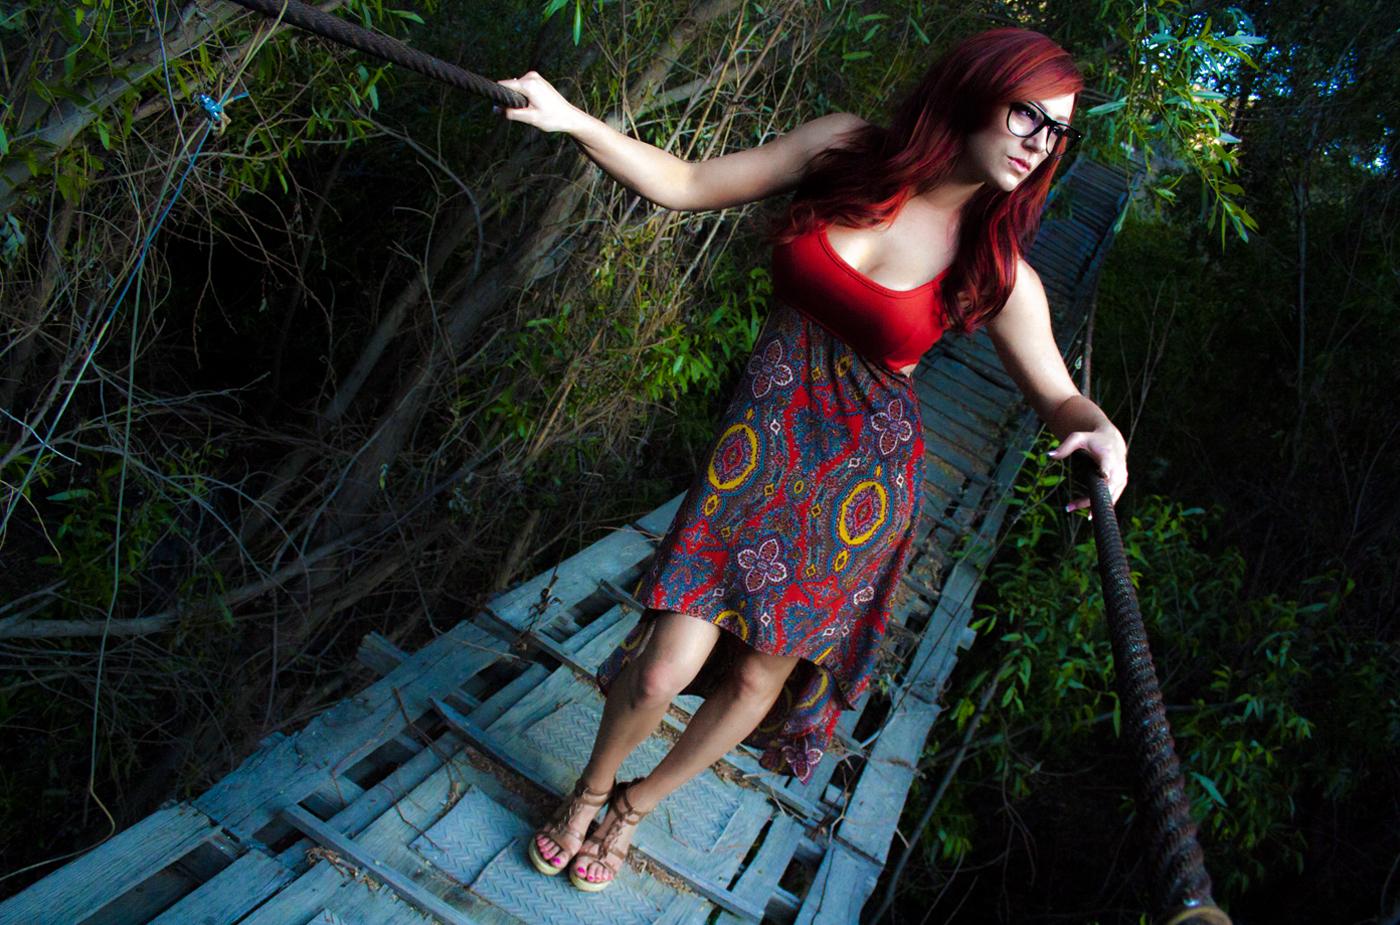 Images © Glamour Model Magazine Staff Photographer Ryan Smiley